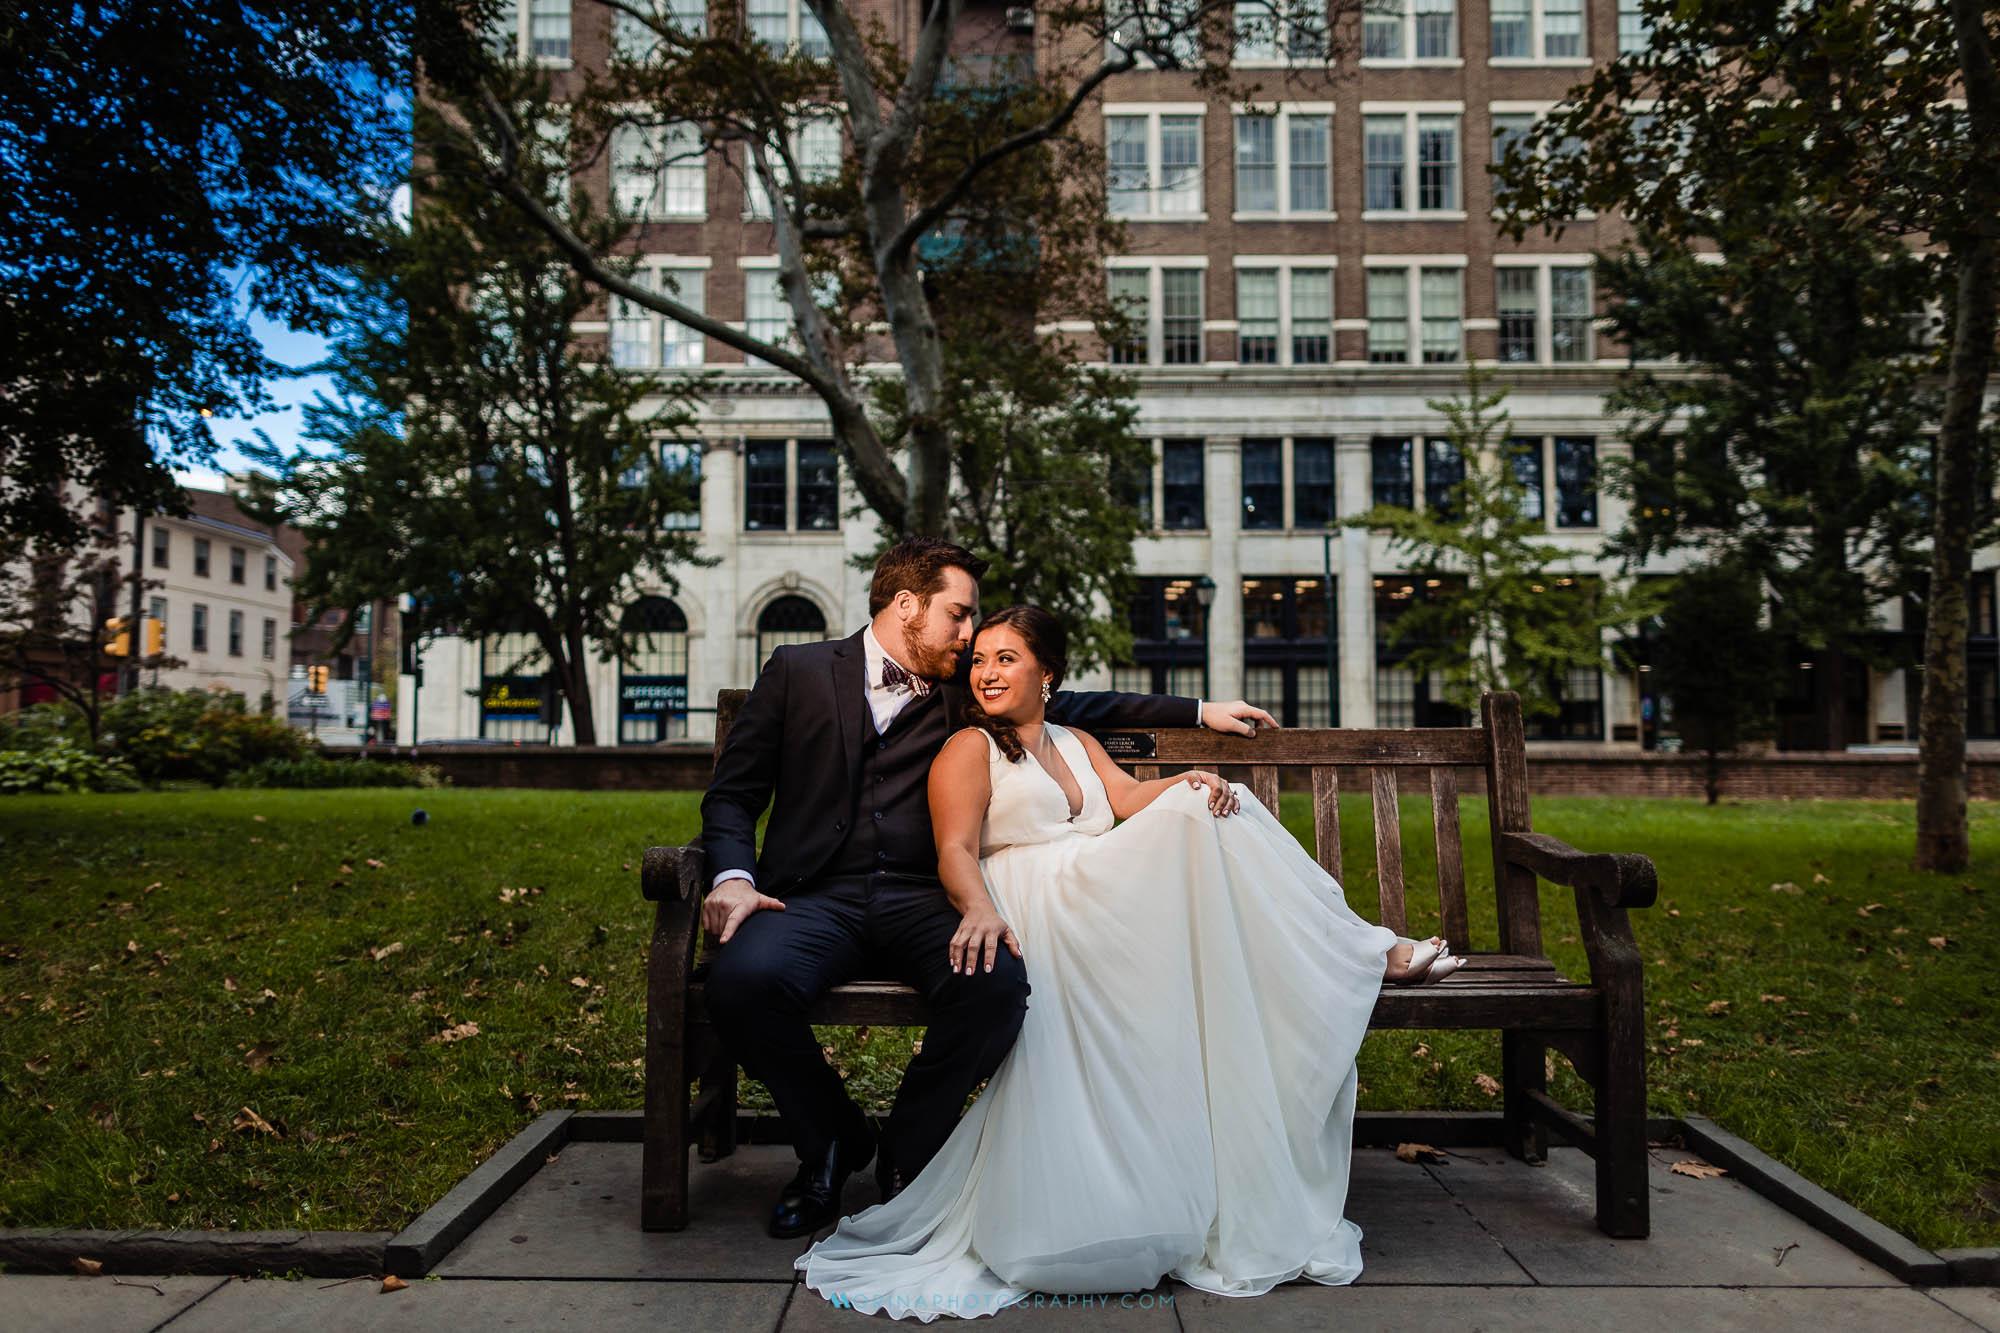 Yuki & Michael Wedding at Morris House Hotel Blog 0039.jpg